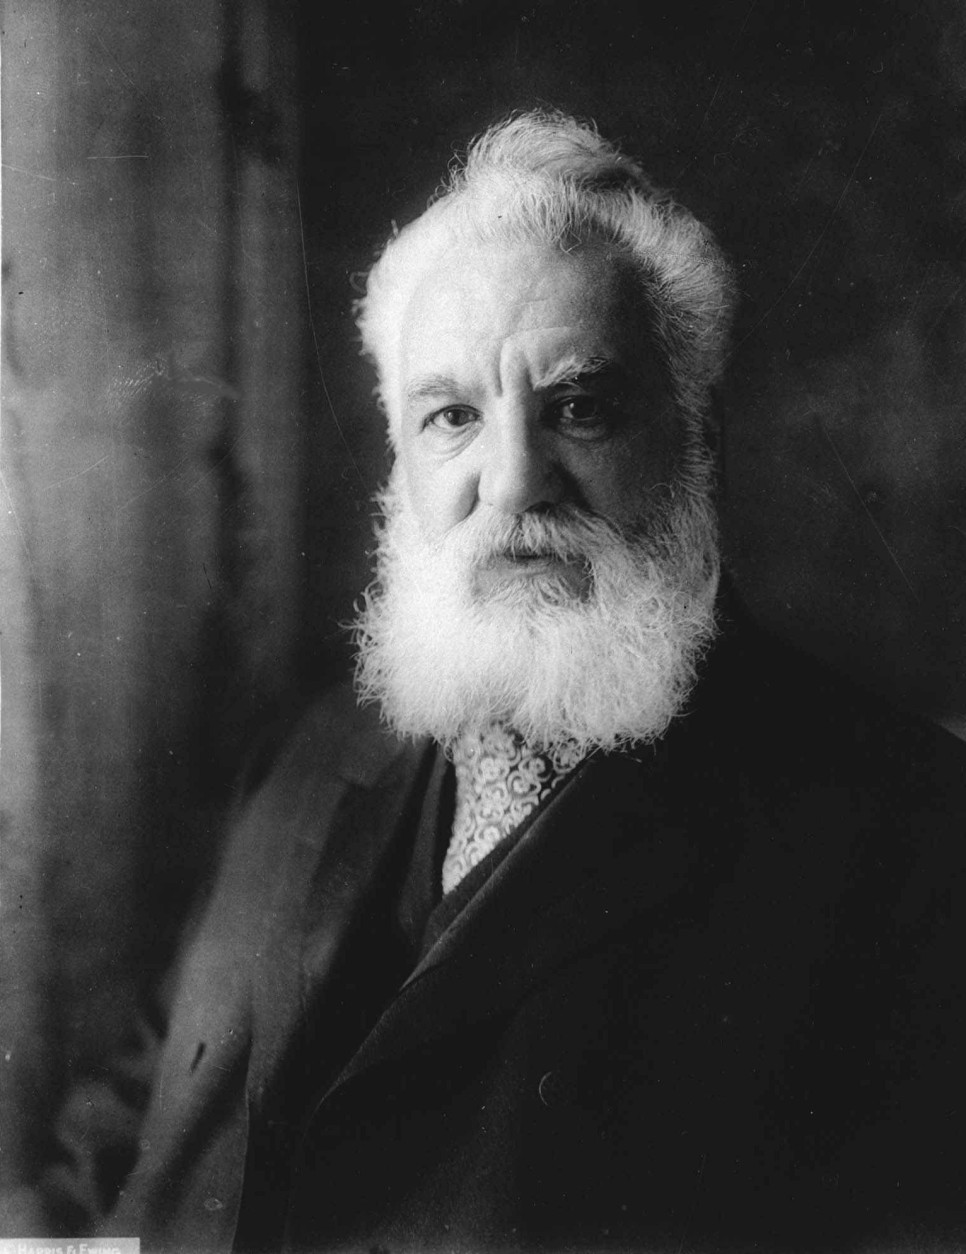 A portrait of Alexander Graham Bell, February 6, 1912. (AP Photo)